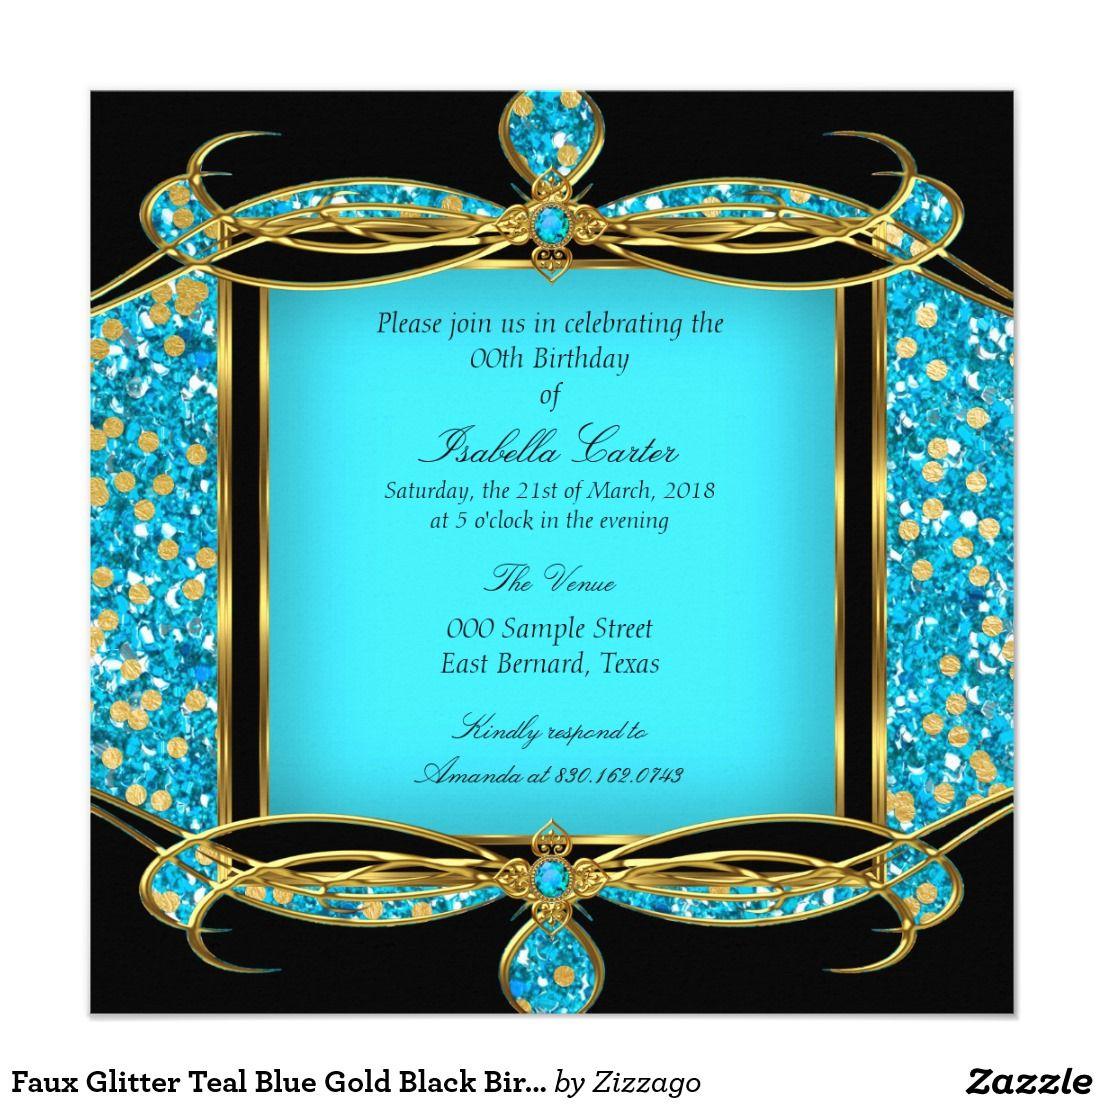 Faux Glitter Teal Blue Gold Black Birthday Party Invitation | Zazzle.com in  2020 | Party invitations, Birthday party invitations, Invitations